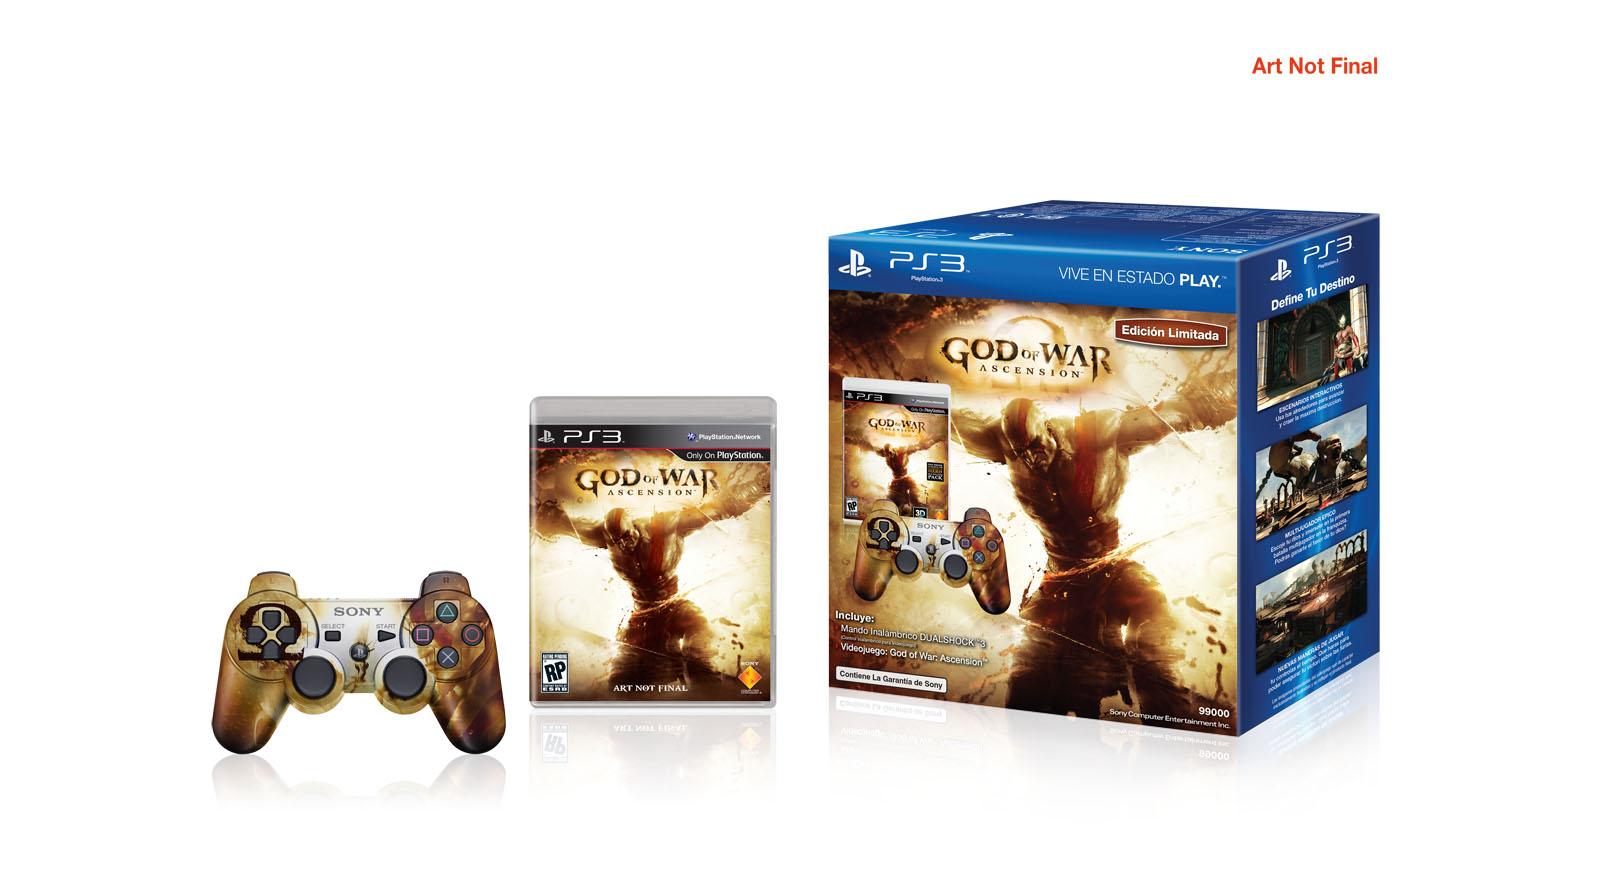 [BRASIL GAME SHOW 2012] Destaques da Coletiva de PlayStation na BGS 2012 8077022489_0a313b83ae_h